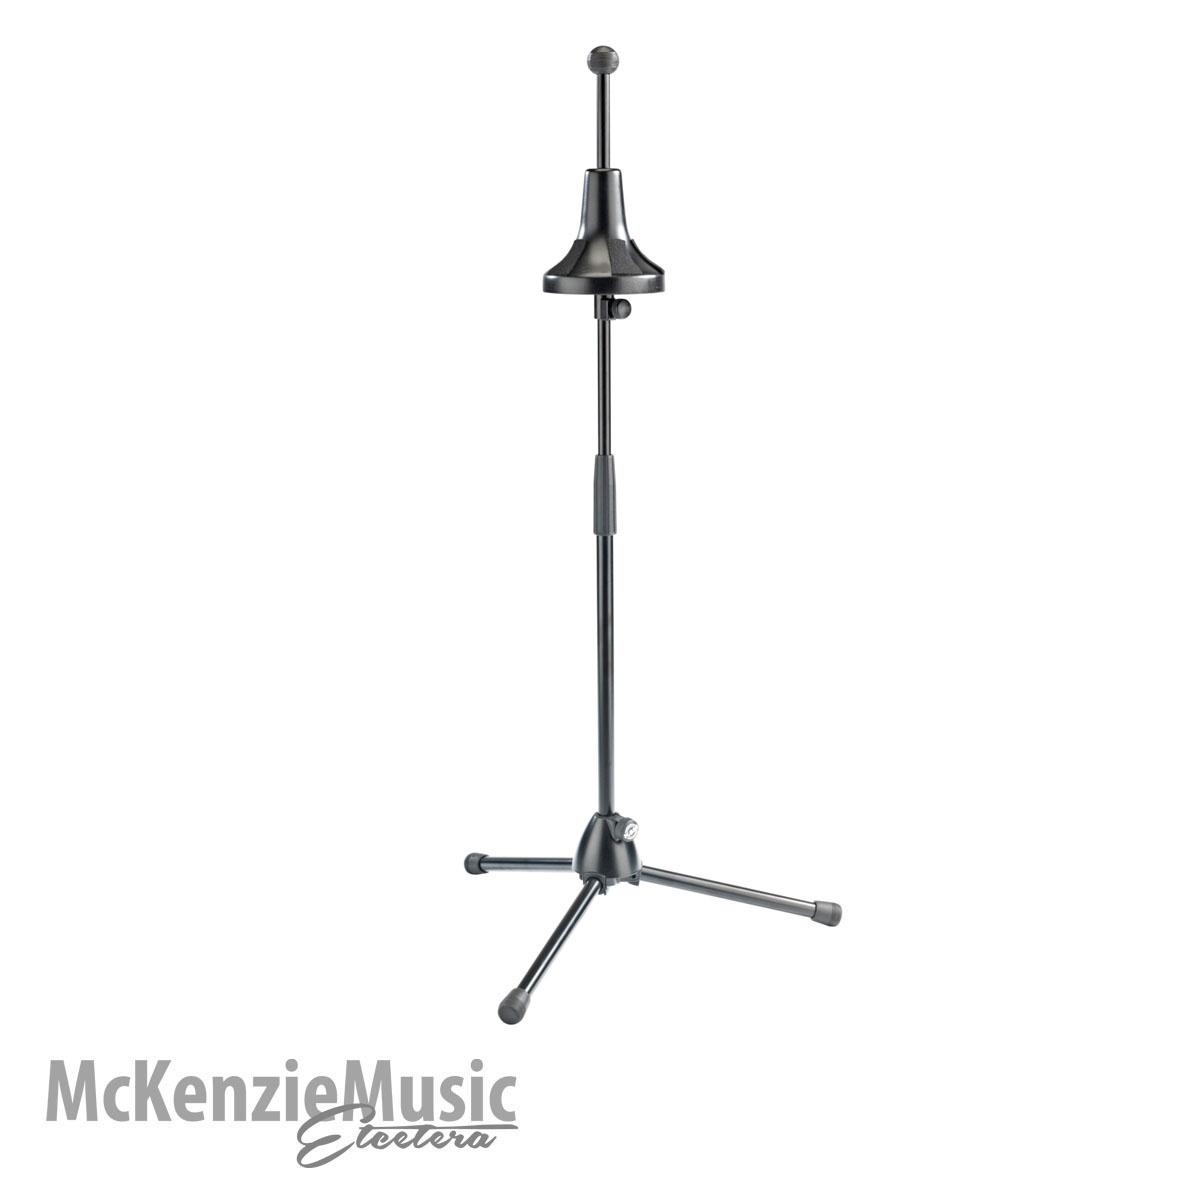 K&M Bass Trombone Stand